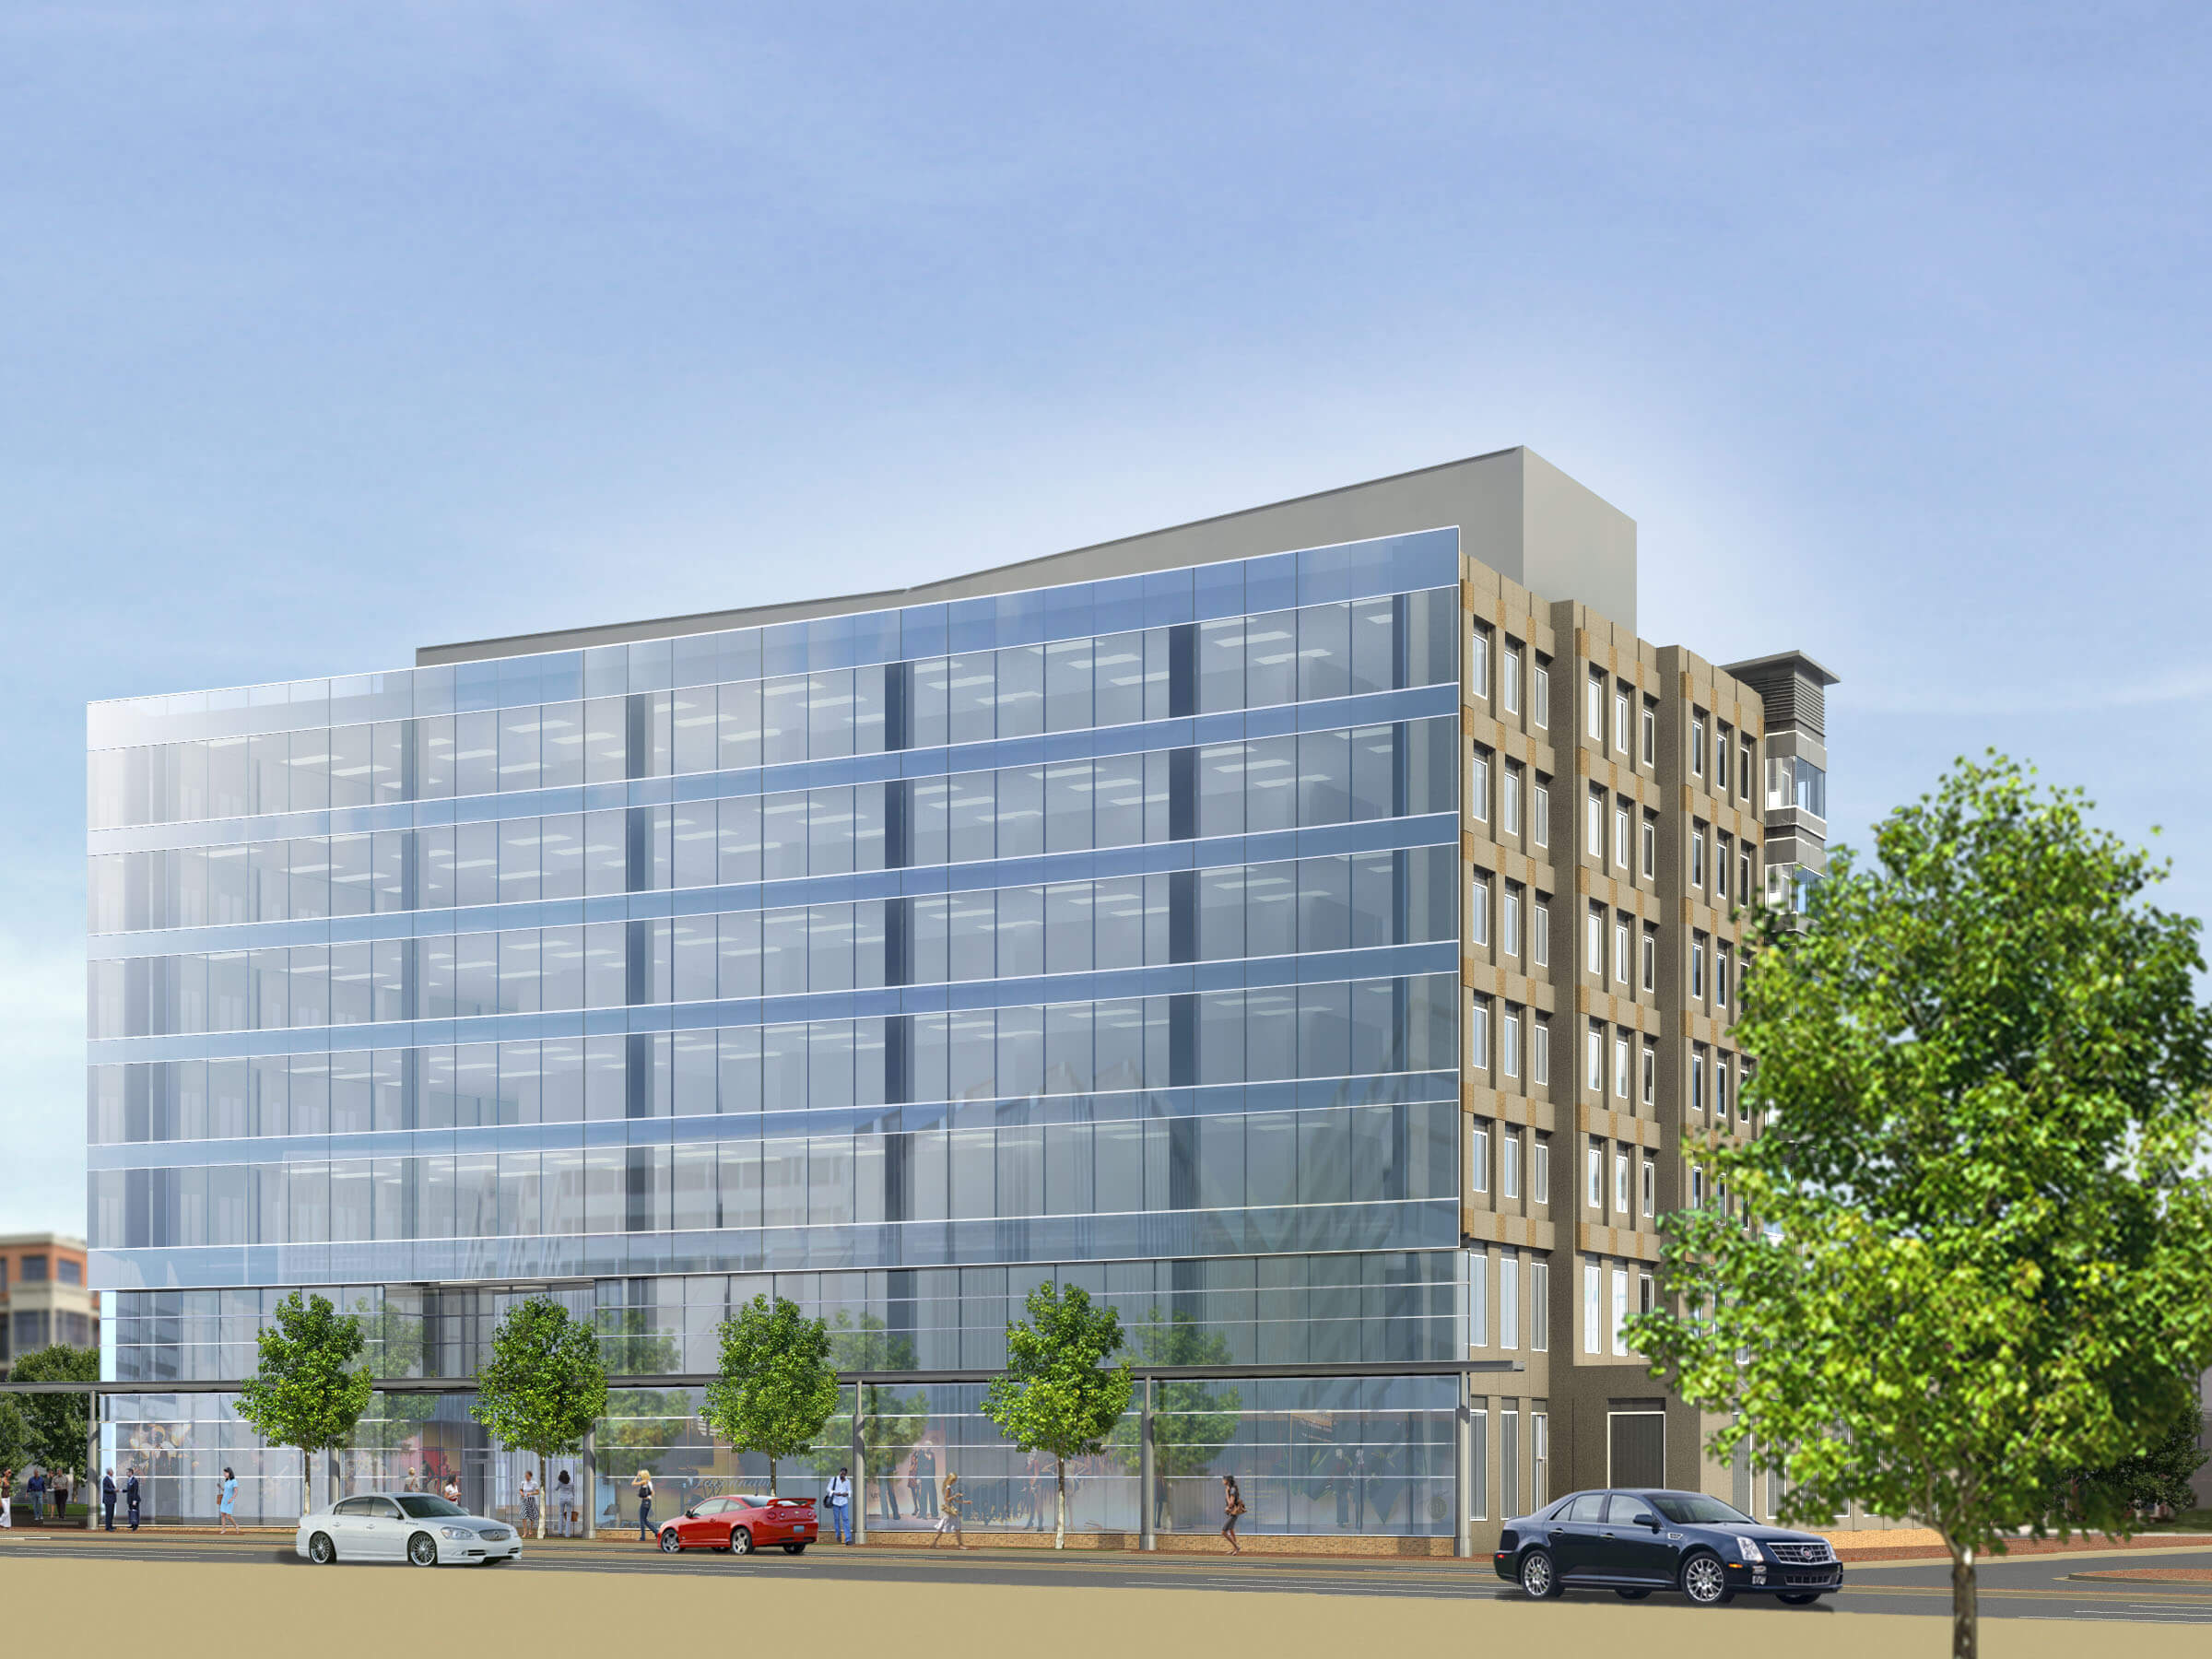 Virginia Tech's research facility at 900 North Glebe Road in located in the Ballston area of Arlington, VA